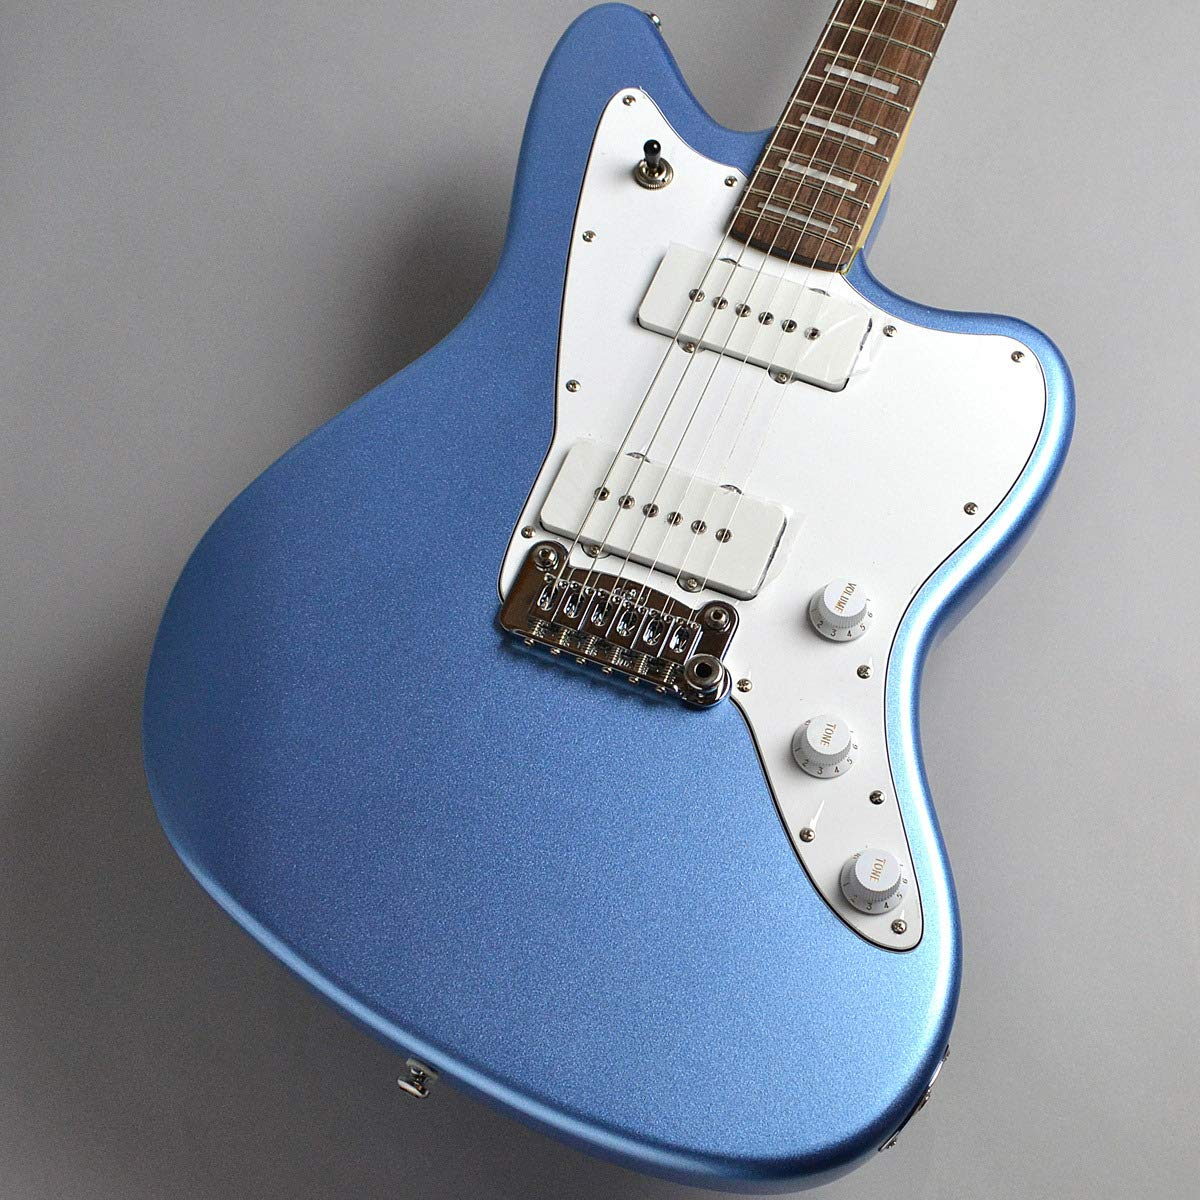 G&L Tribute Series Doheny G&L Tribute/Rosewood Fingerboard エレキギター/Lake Placid Blue エレキギター B07JPBKQ2B, 平田照樹堂『歌舞伎ごのみ』:54f4af02 --- pvosasco.org.br